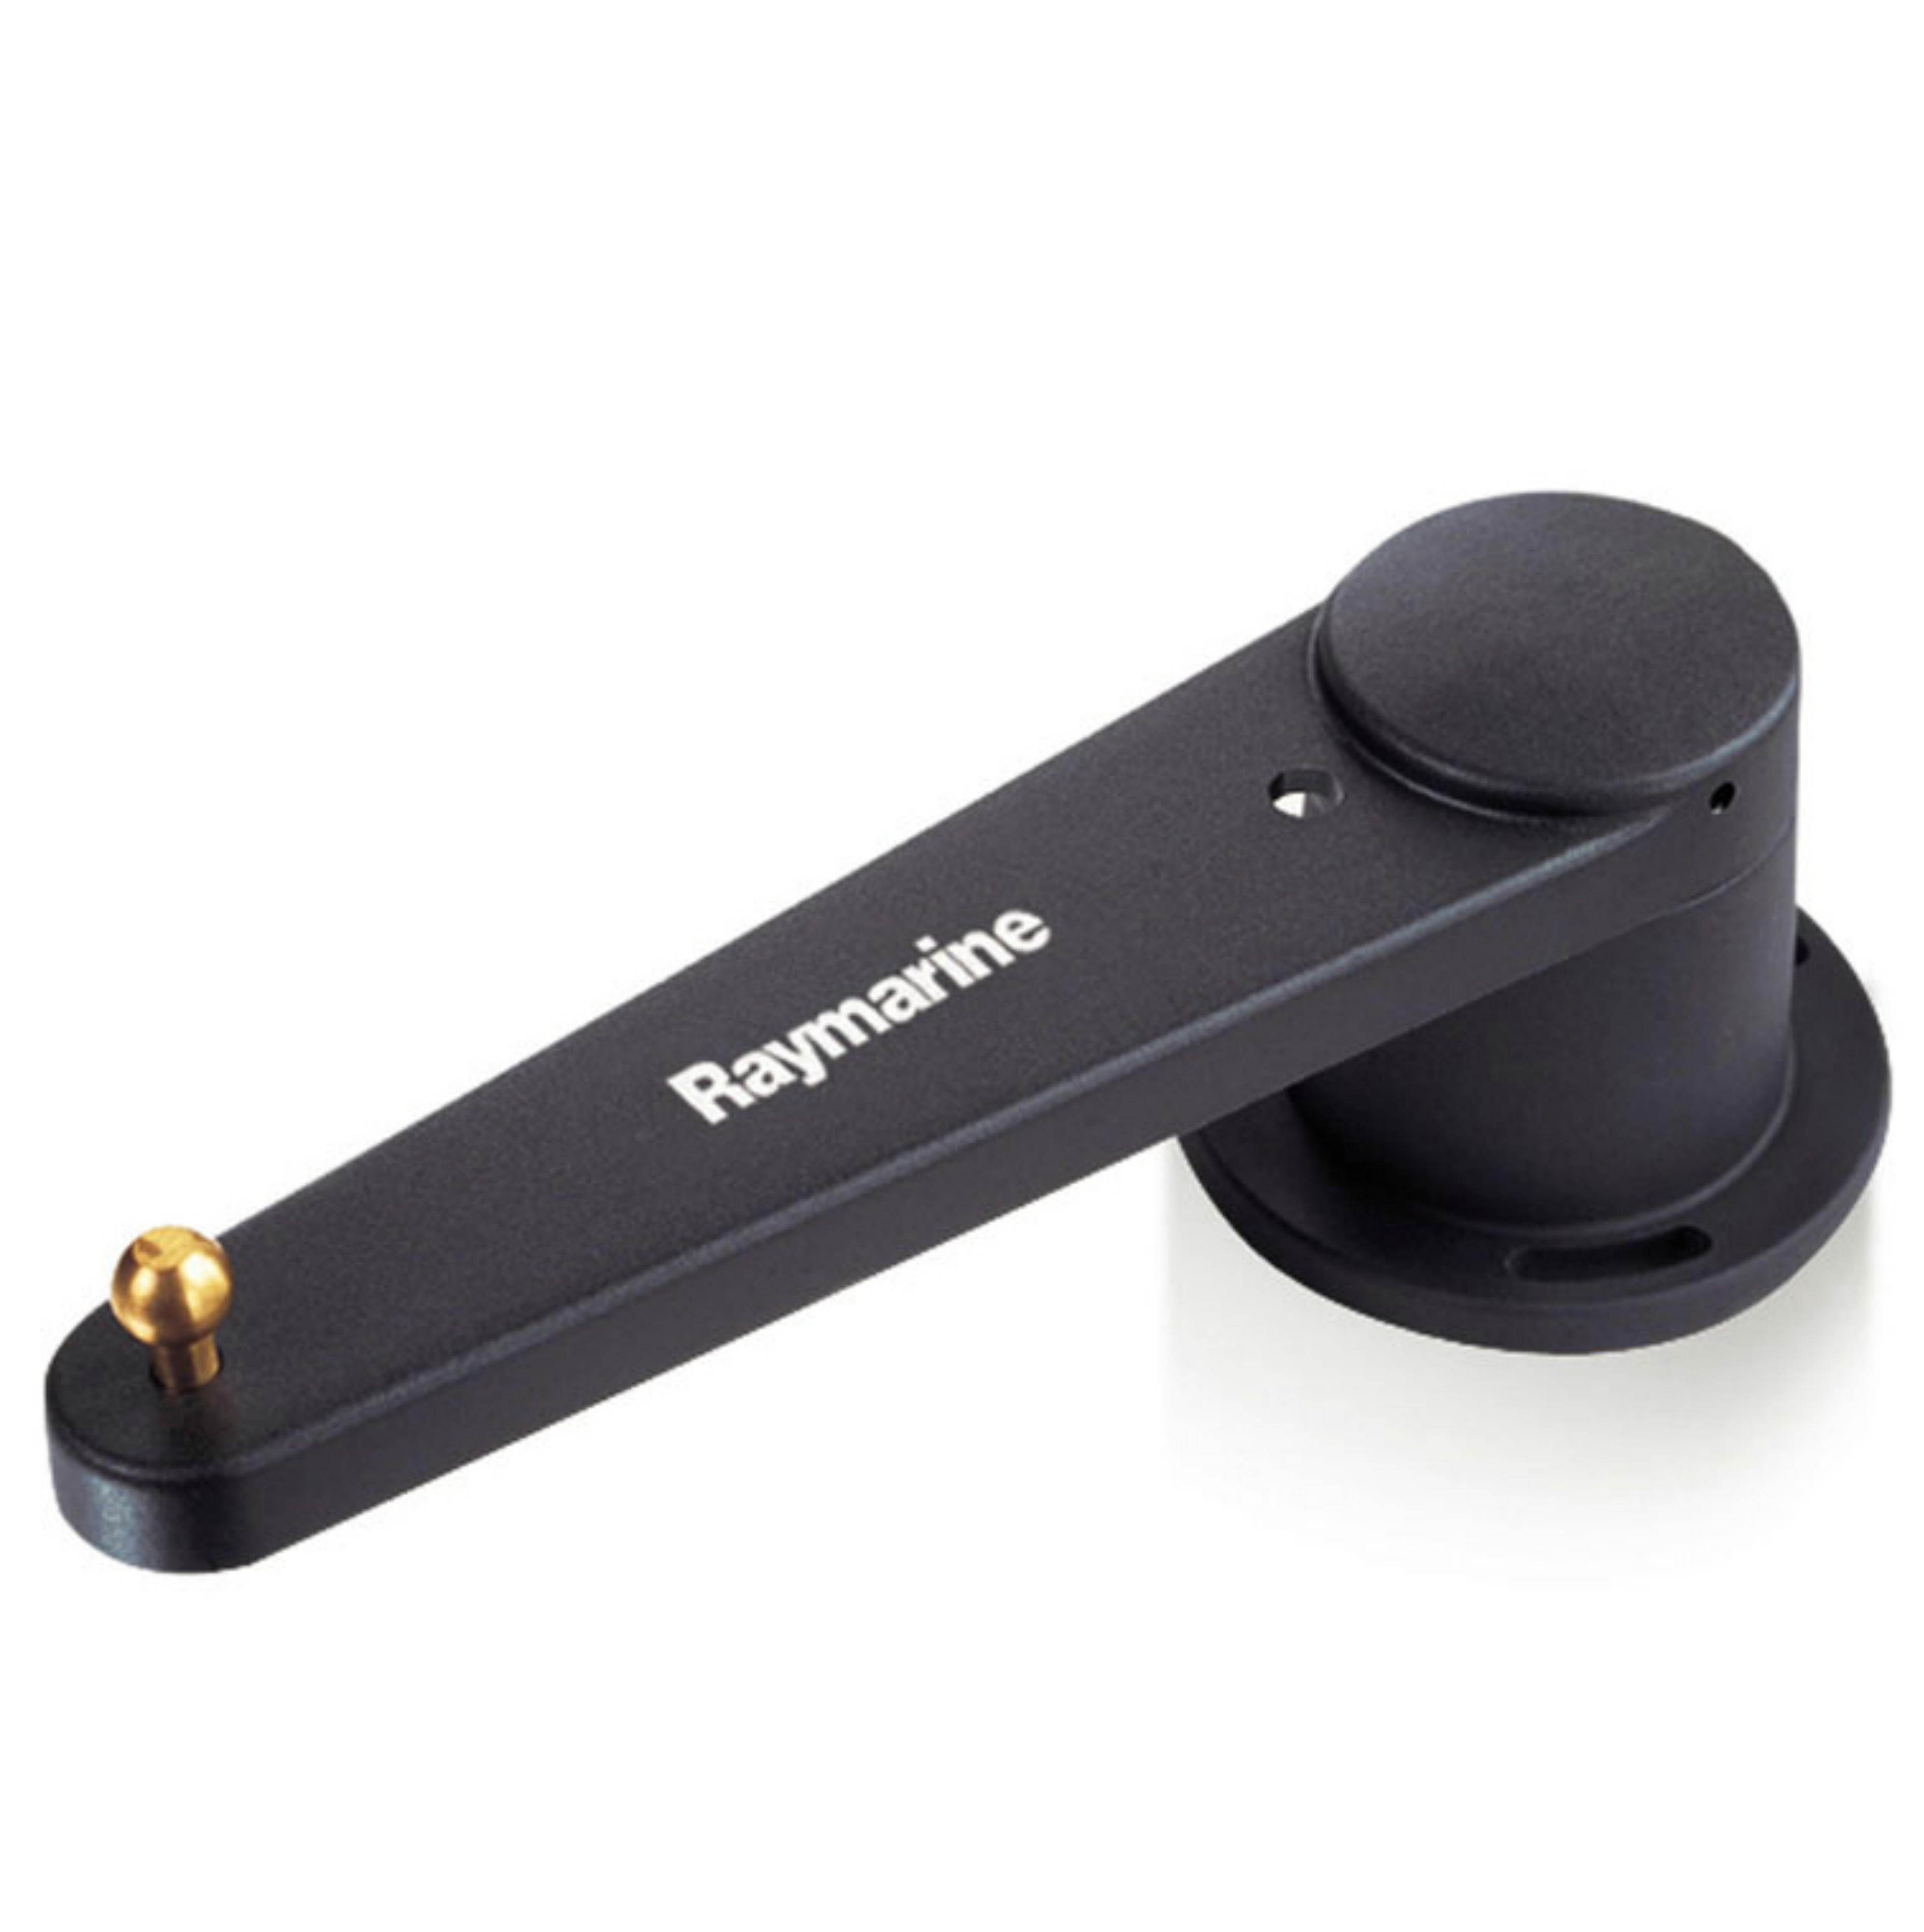 Raymarine-M81105|Rudder Angle Transducer|iTC-5 ST60 ST290 Compitable|For Marine